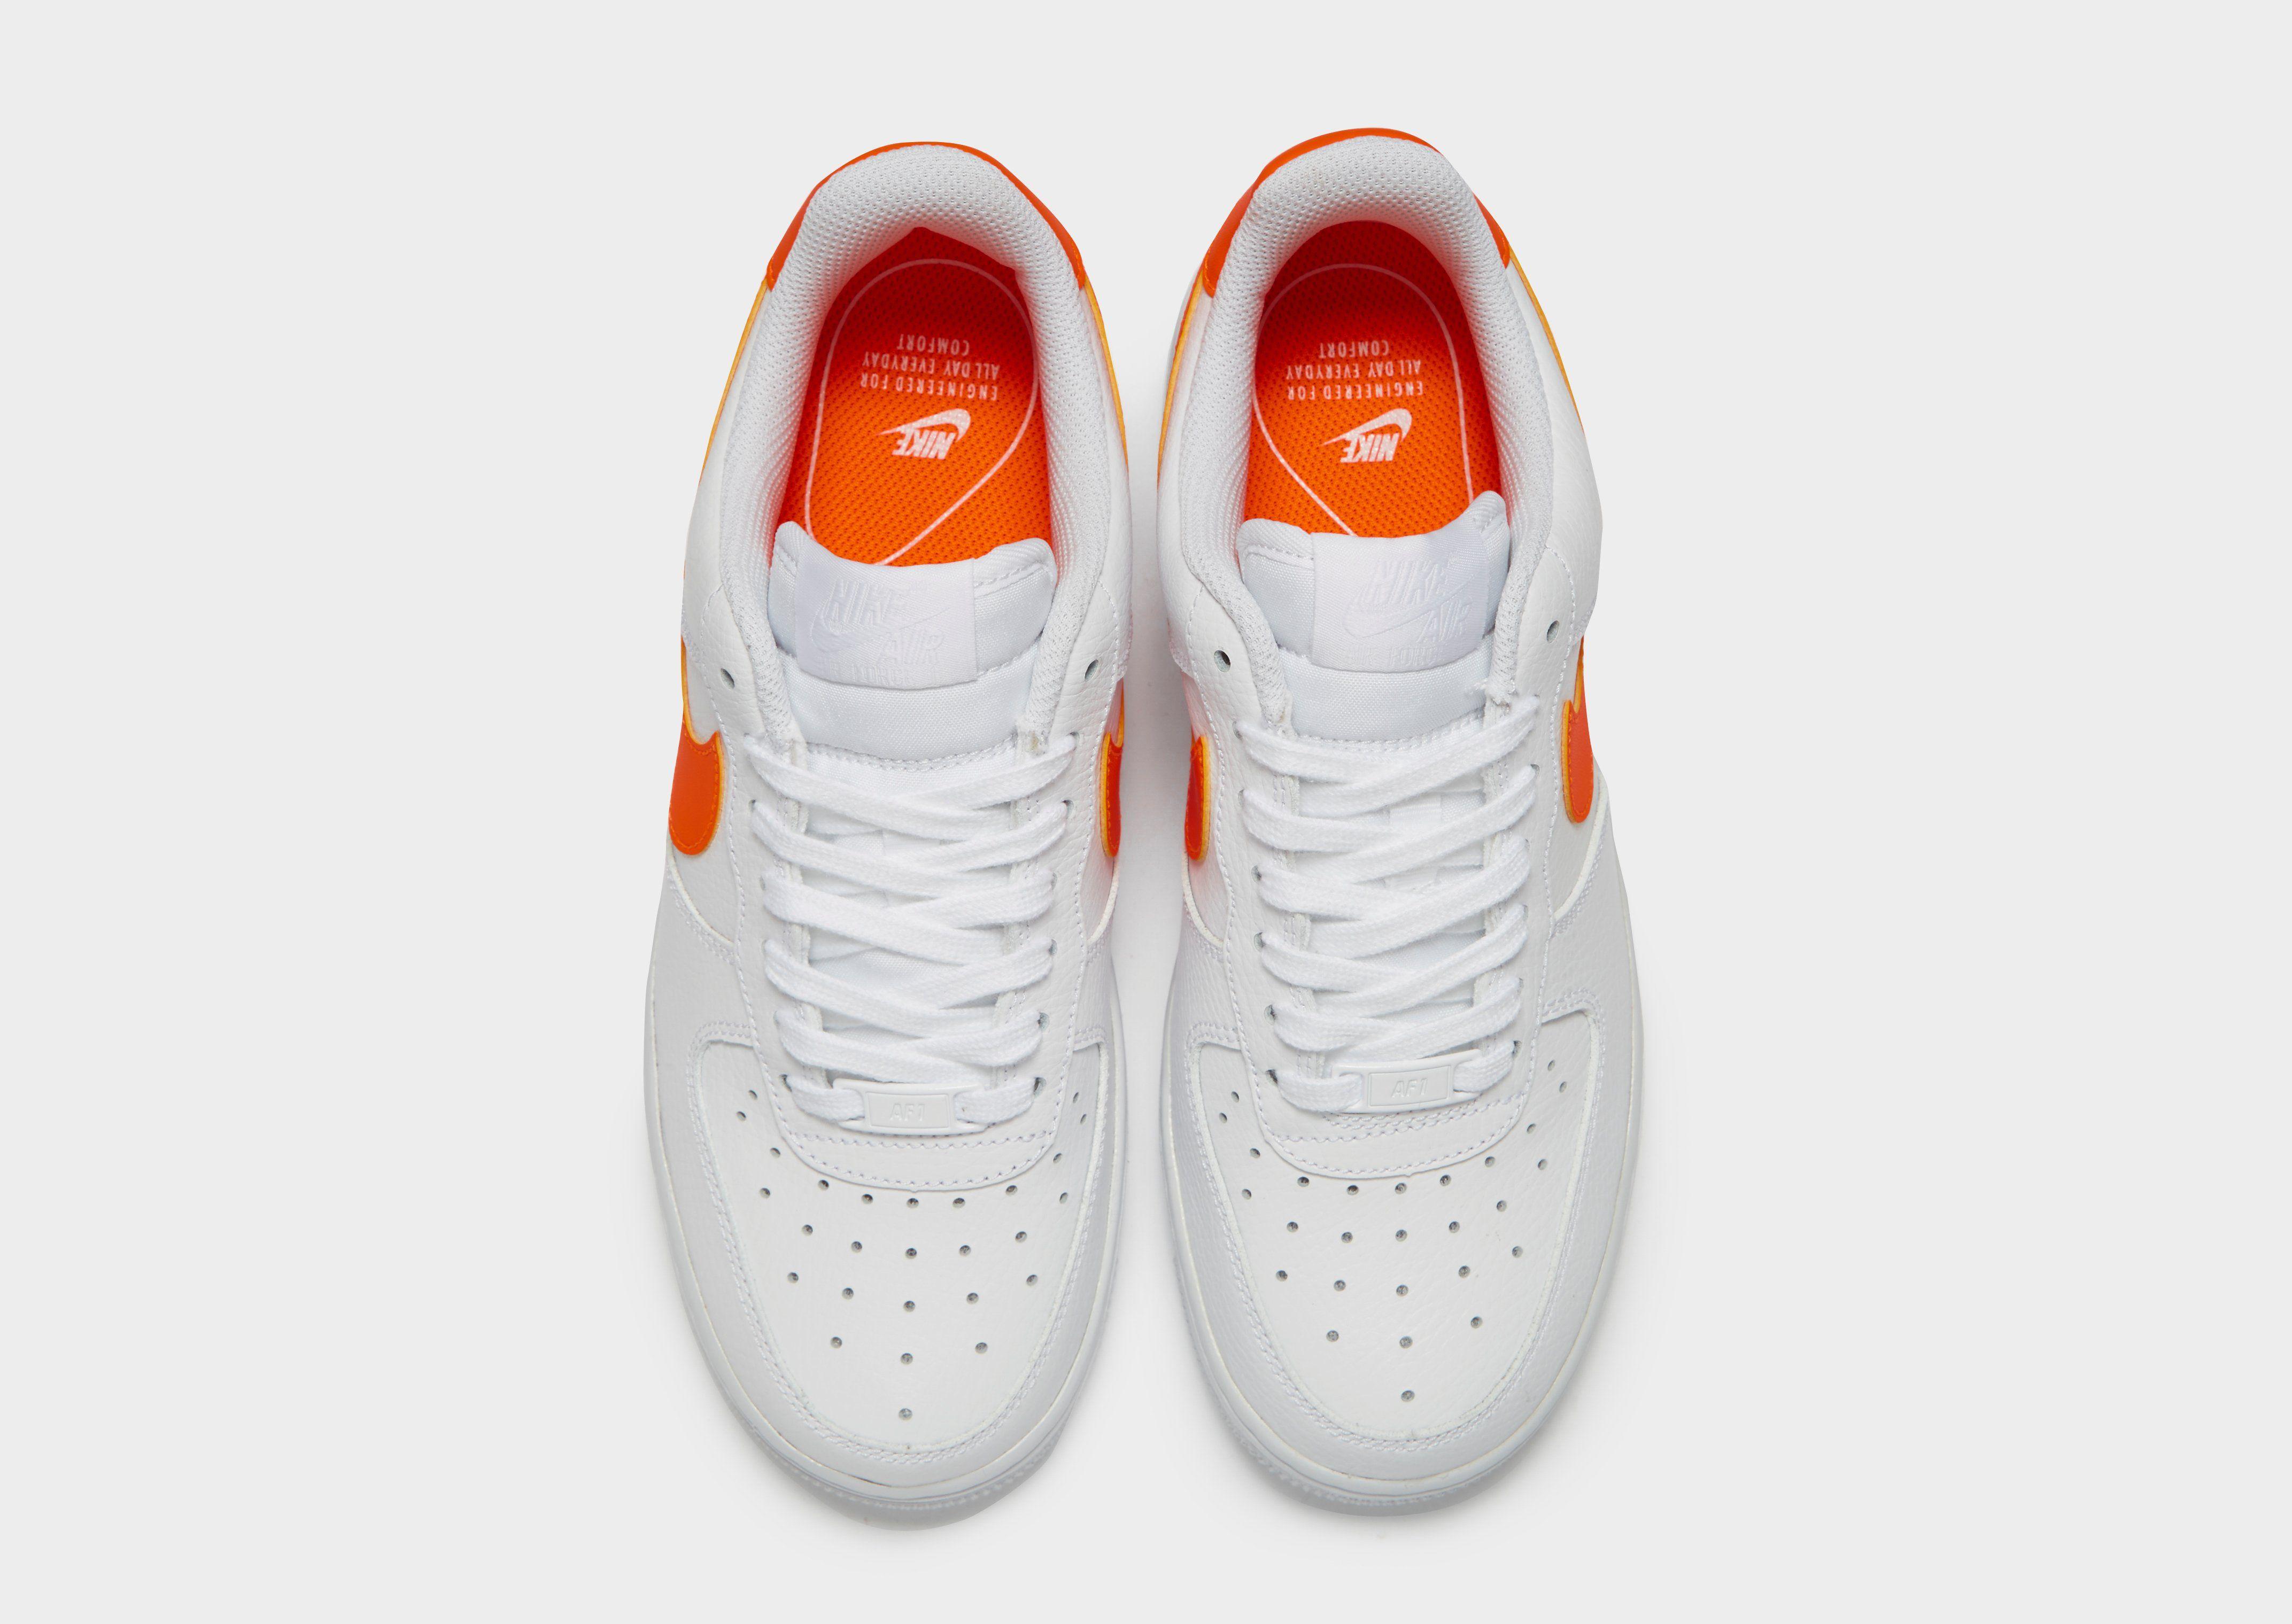 Nike Air Force 1 '07 LV8 Femme